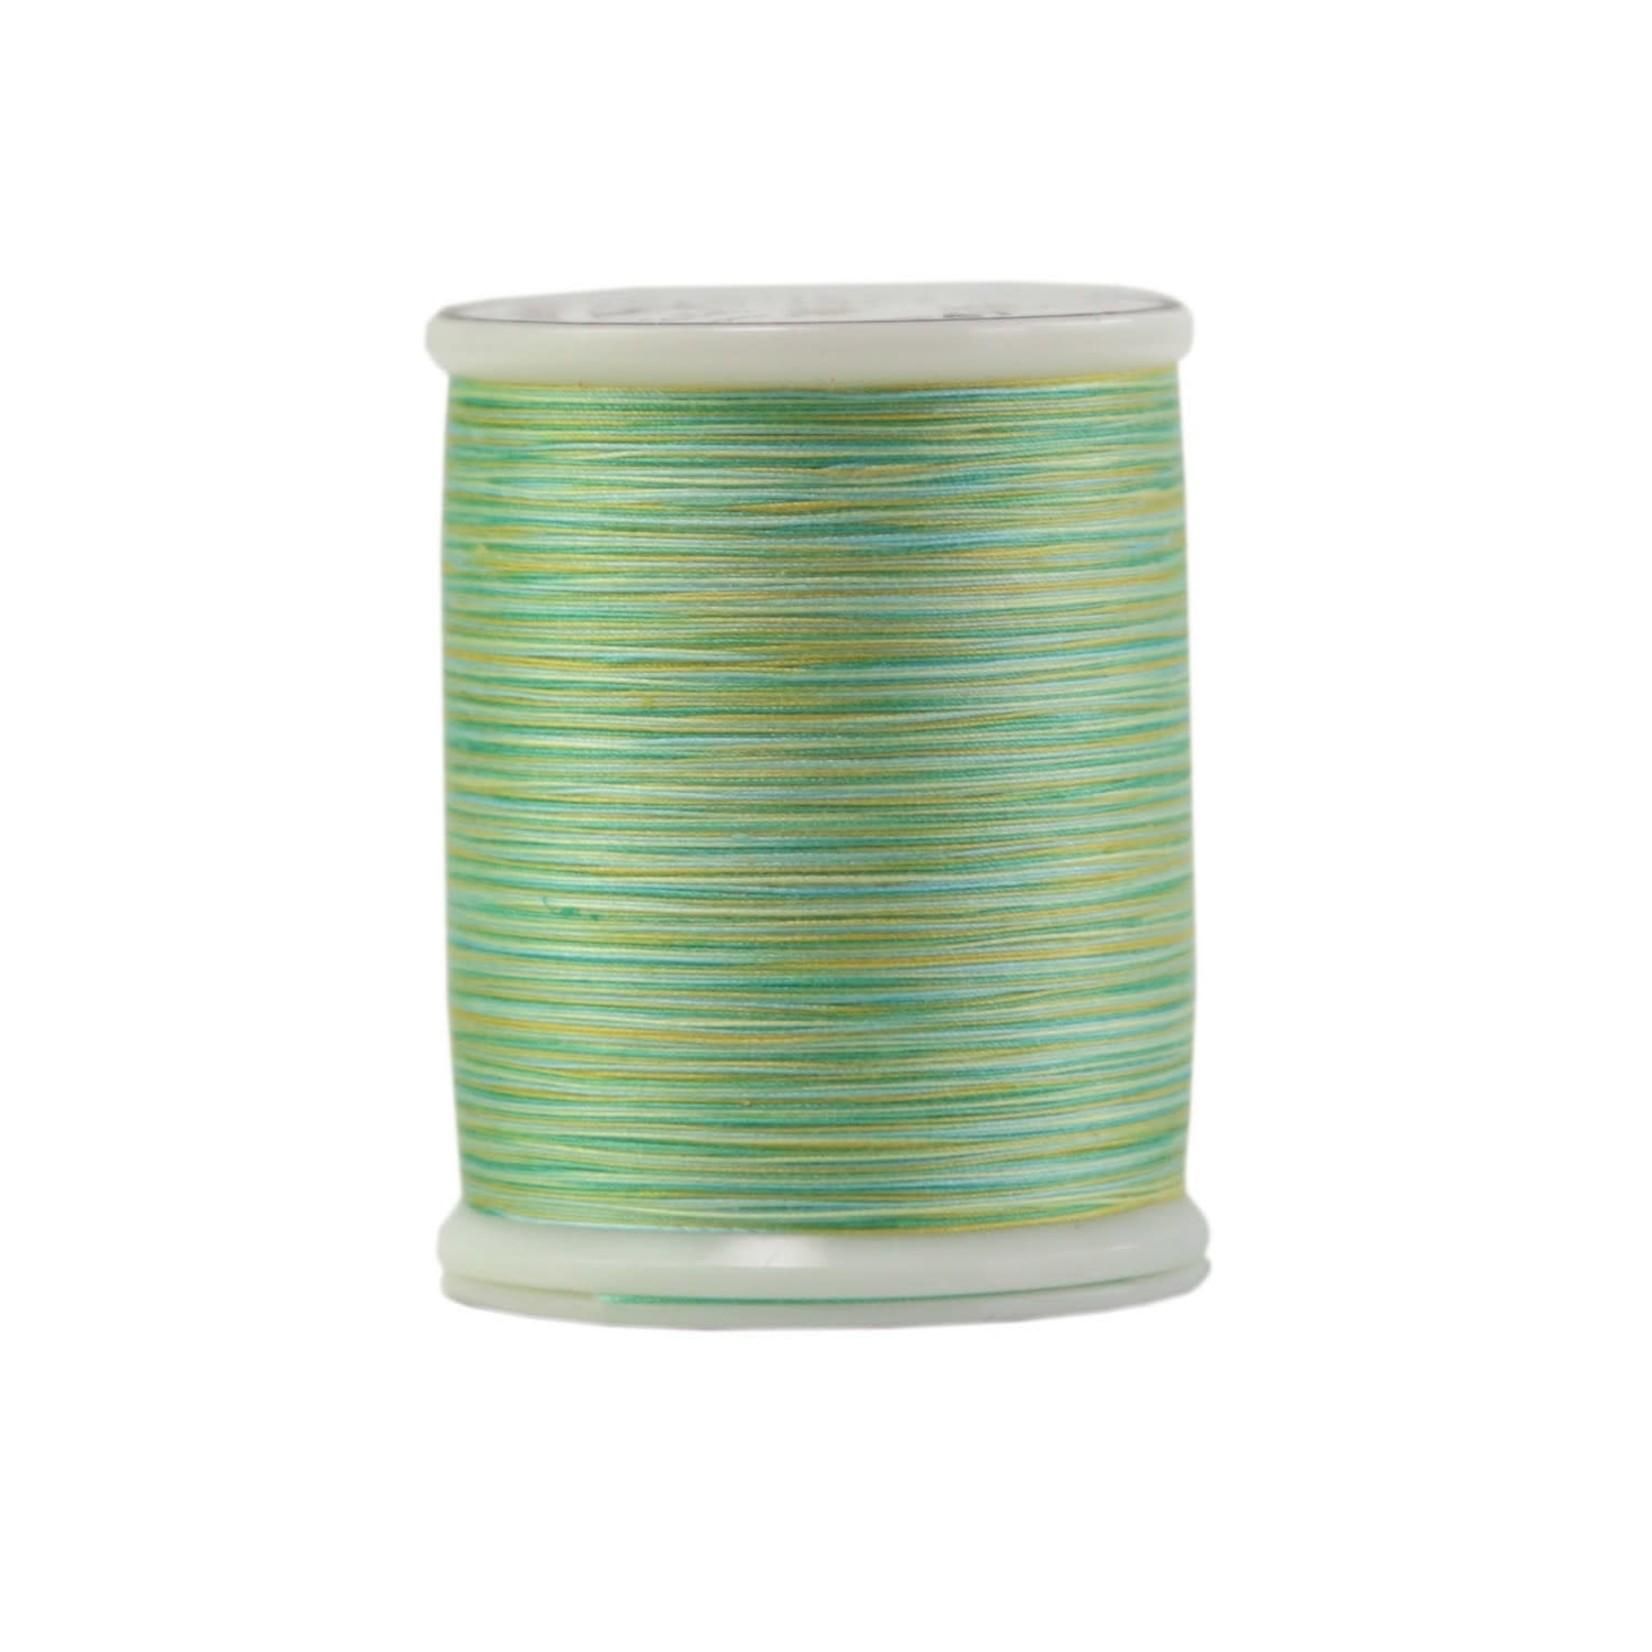 Superior Threads King Tut - #40 - 457 m - 1047 Afresh